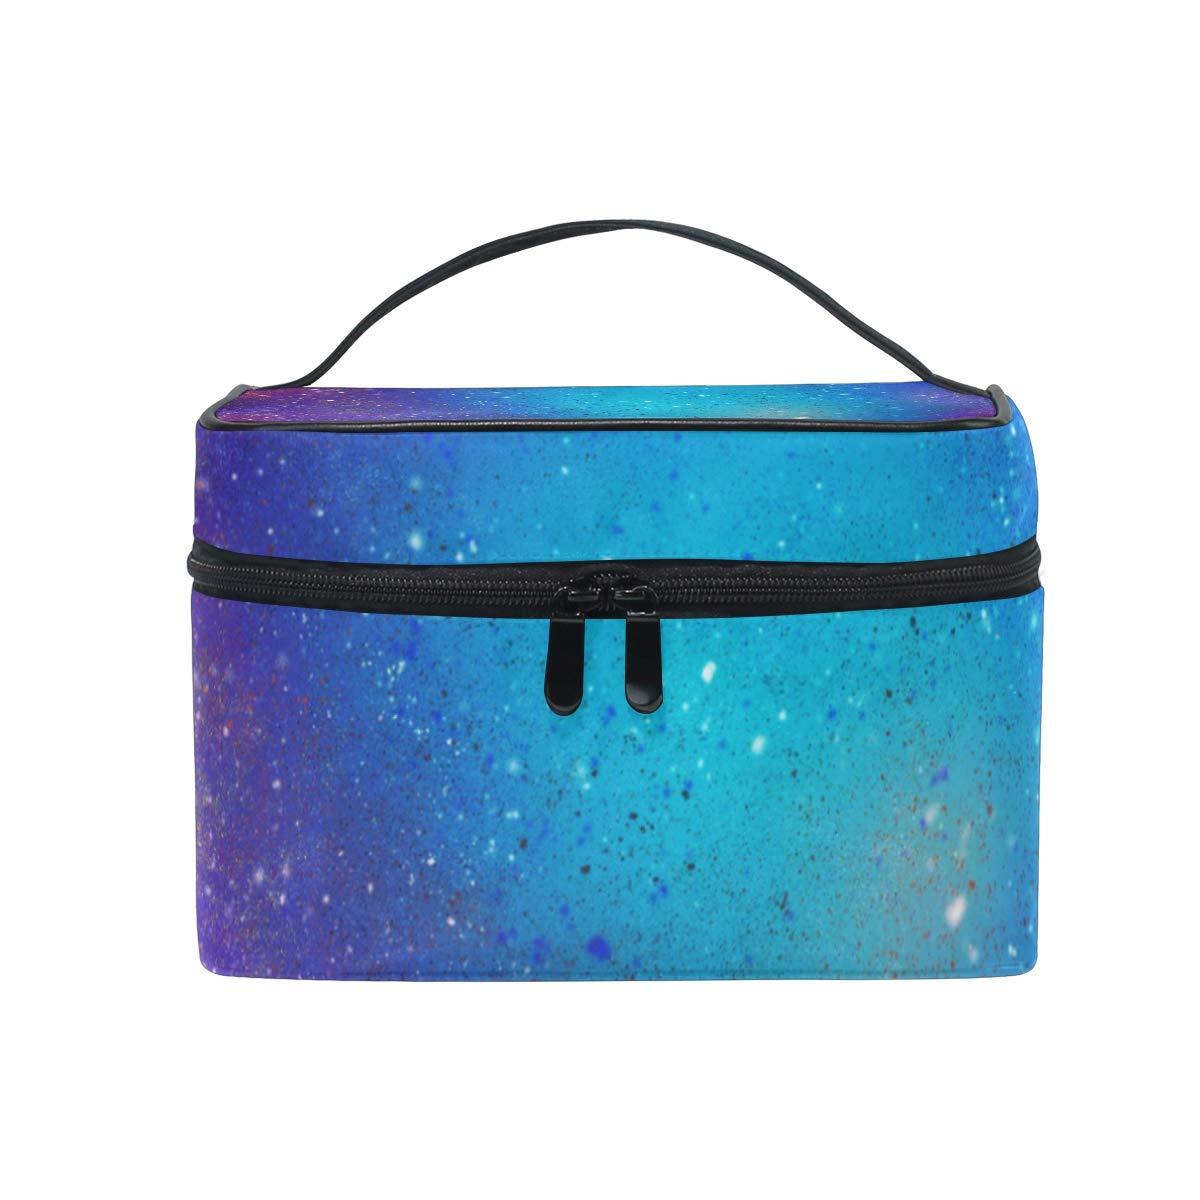 Large Travel Makeup Train Case Galaxy Magic Carrying Portable Zip Cosmetic Brush Bag Makeup Bag Organizer for Girls Women